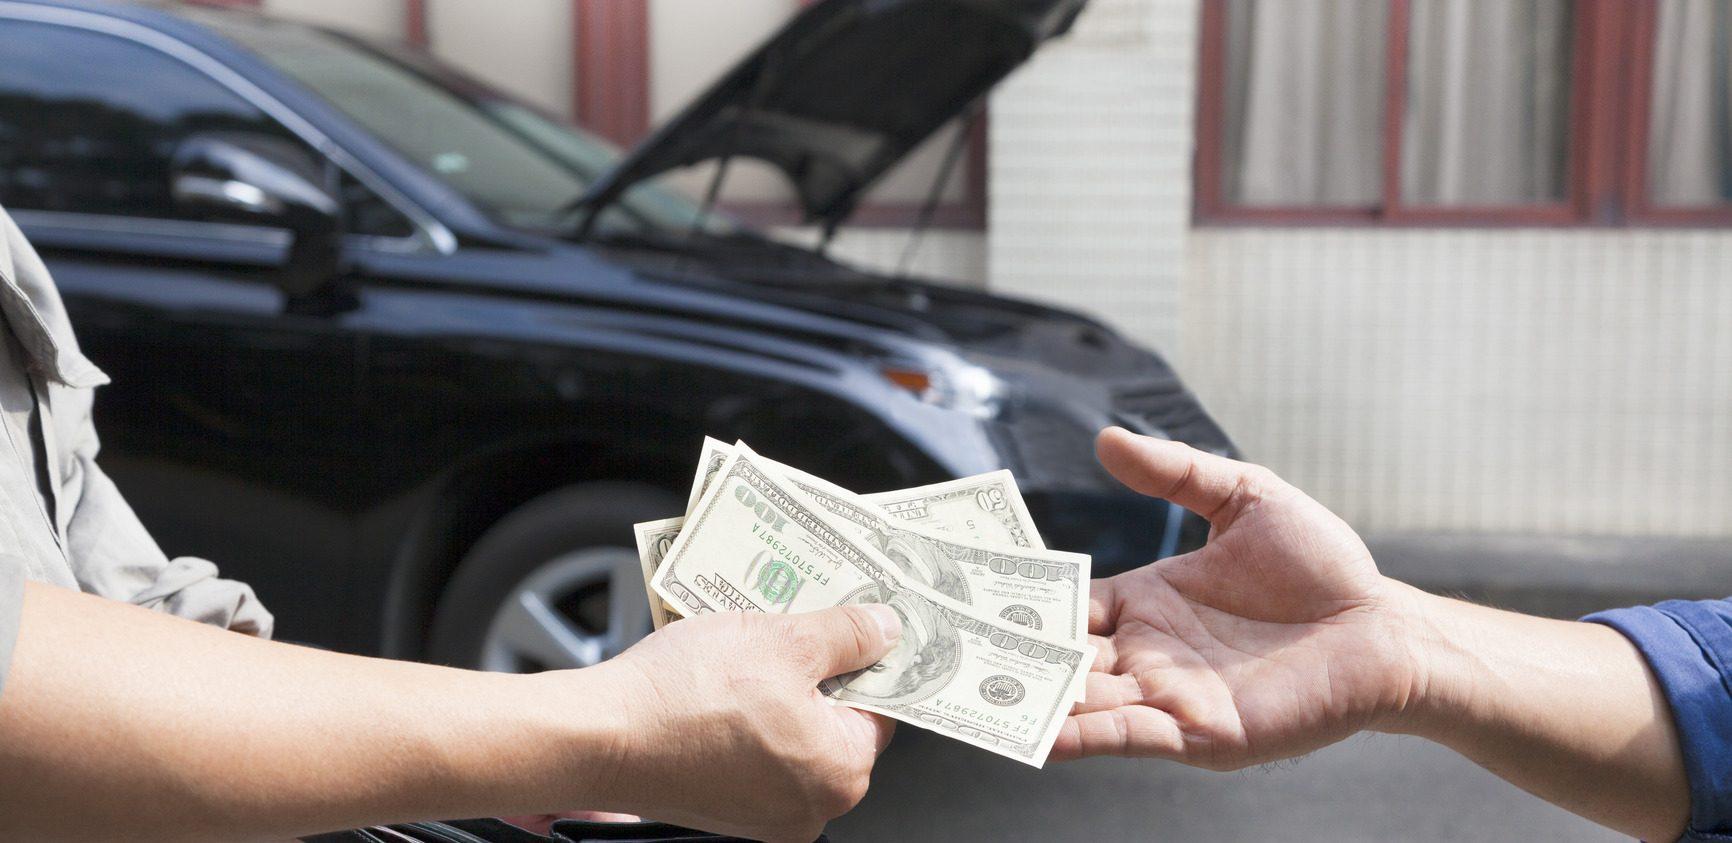 Кредит под залог транспортного средства